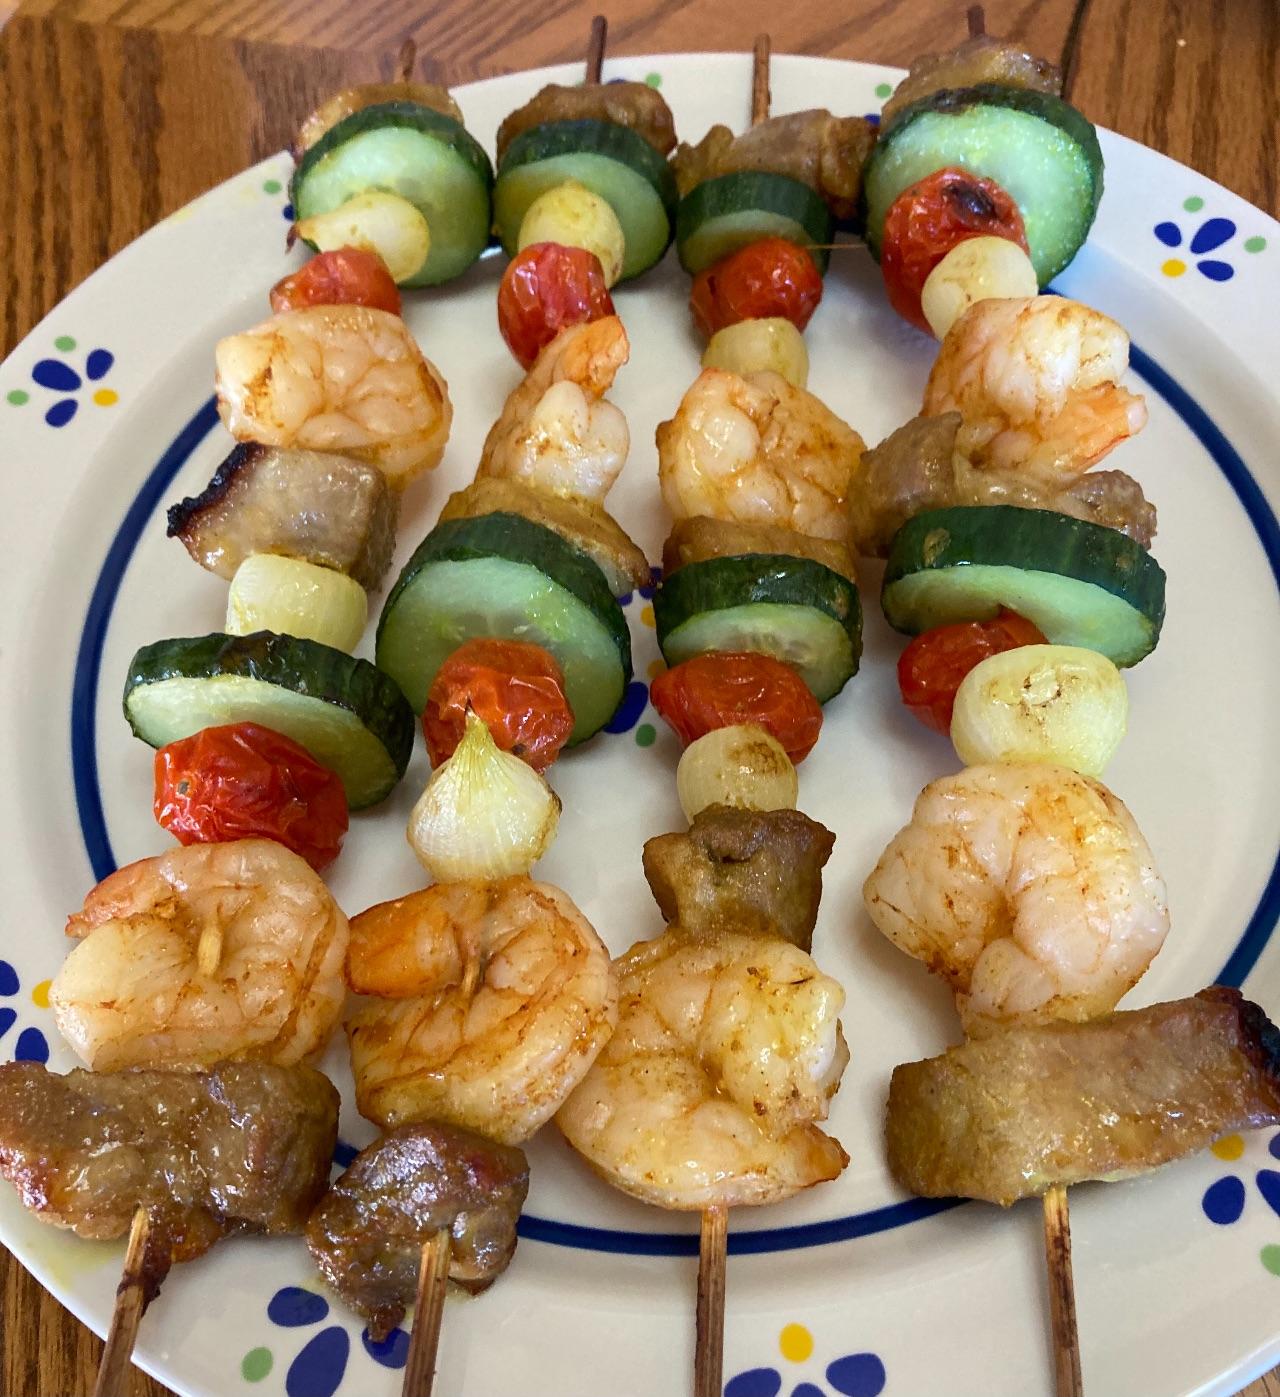 Pork and shrimp kebabs, on a plate